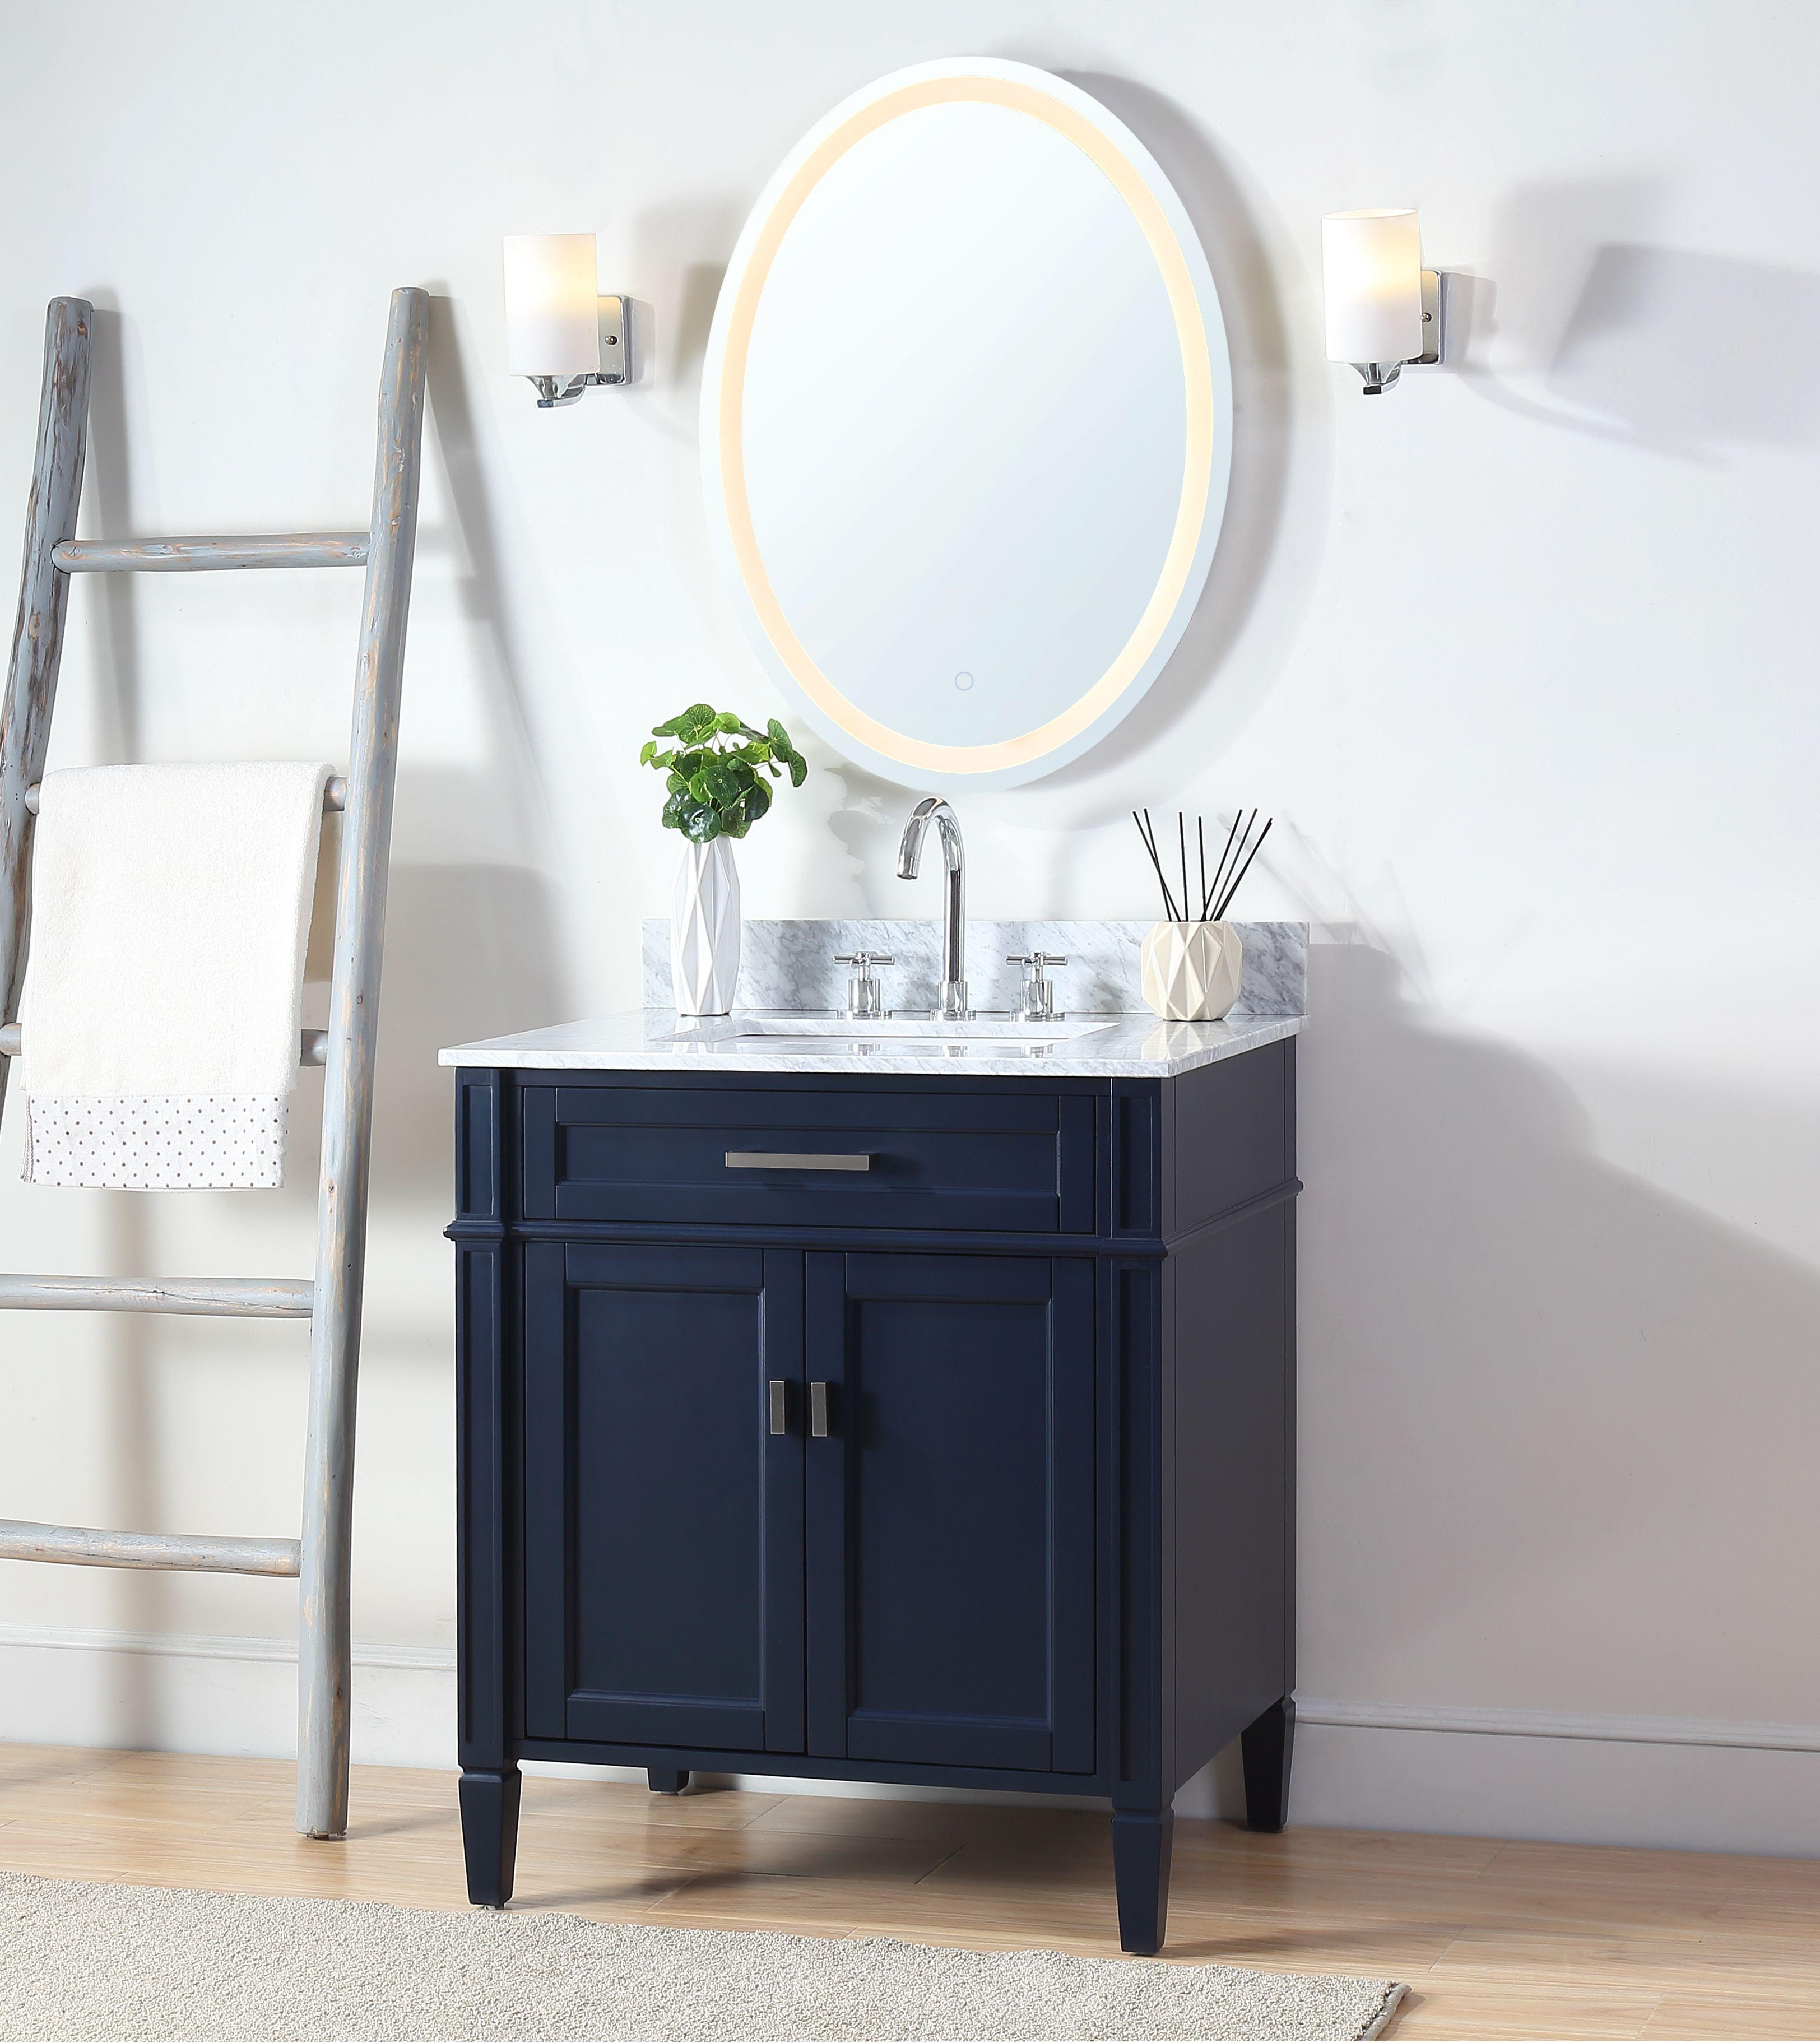 30 Tennant Brand Durand Navy Blue Bathroom Sink Vanity 30 Inch Bathroom Vanity Blue Bathroom Contemporary Bathroom Designs